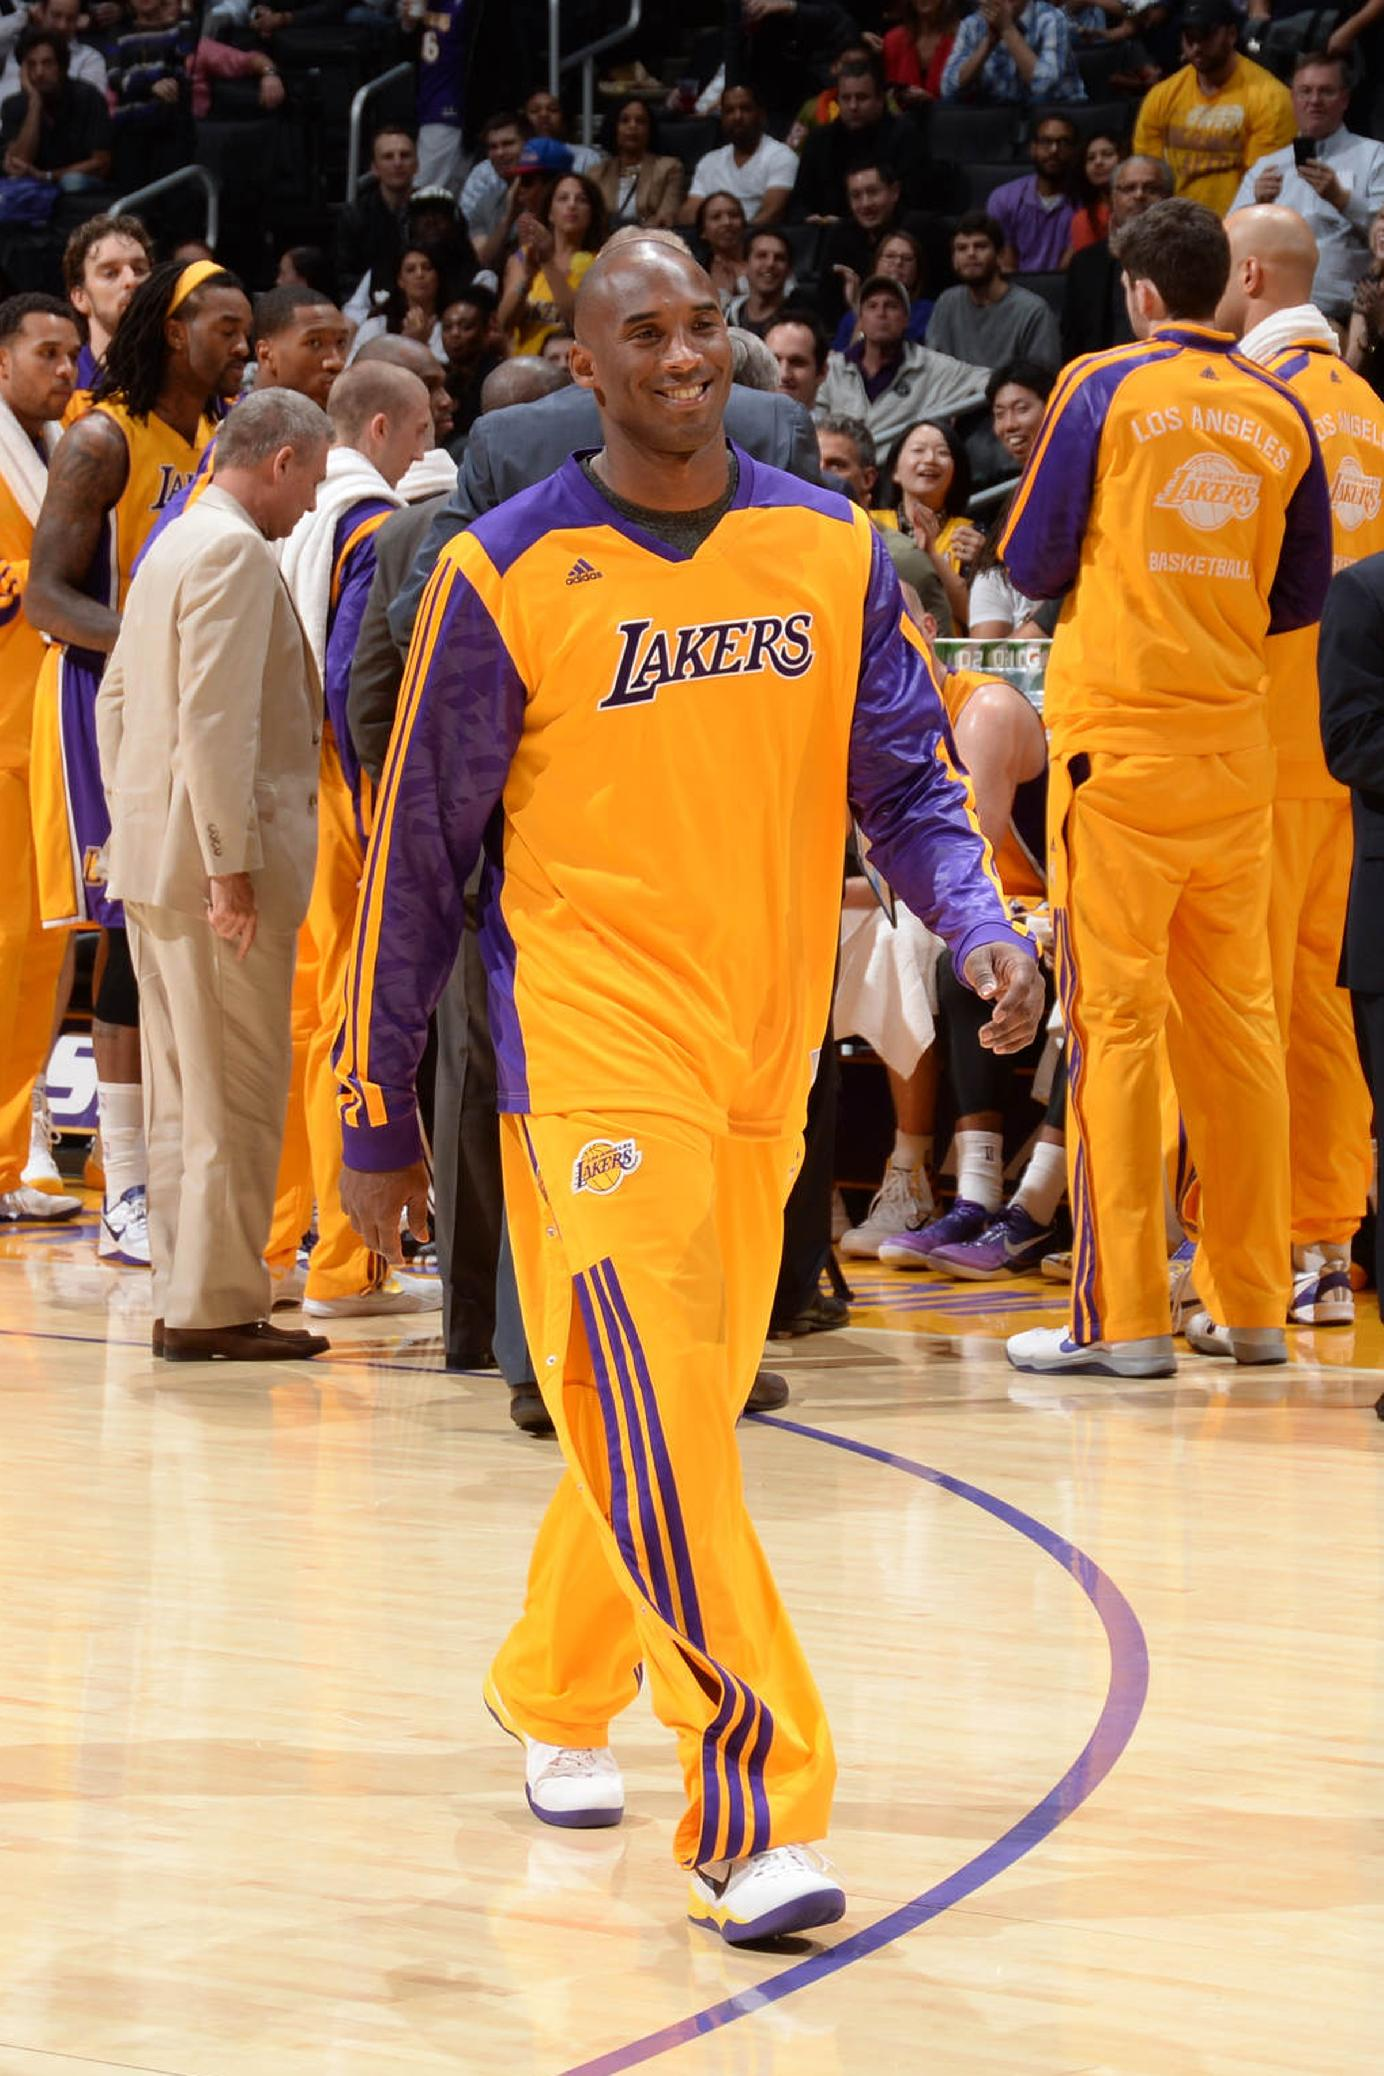 Kobe Bryant returns to practice with LA Lakers